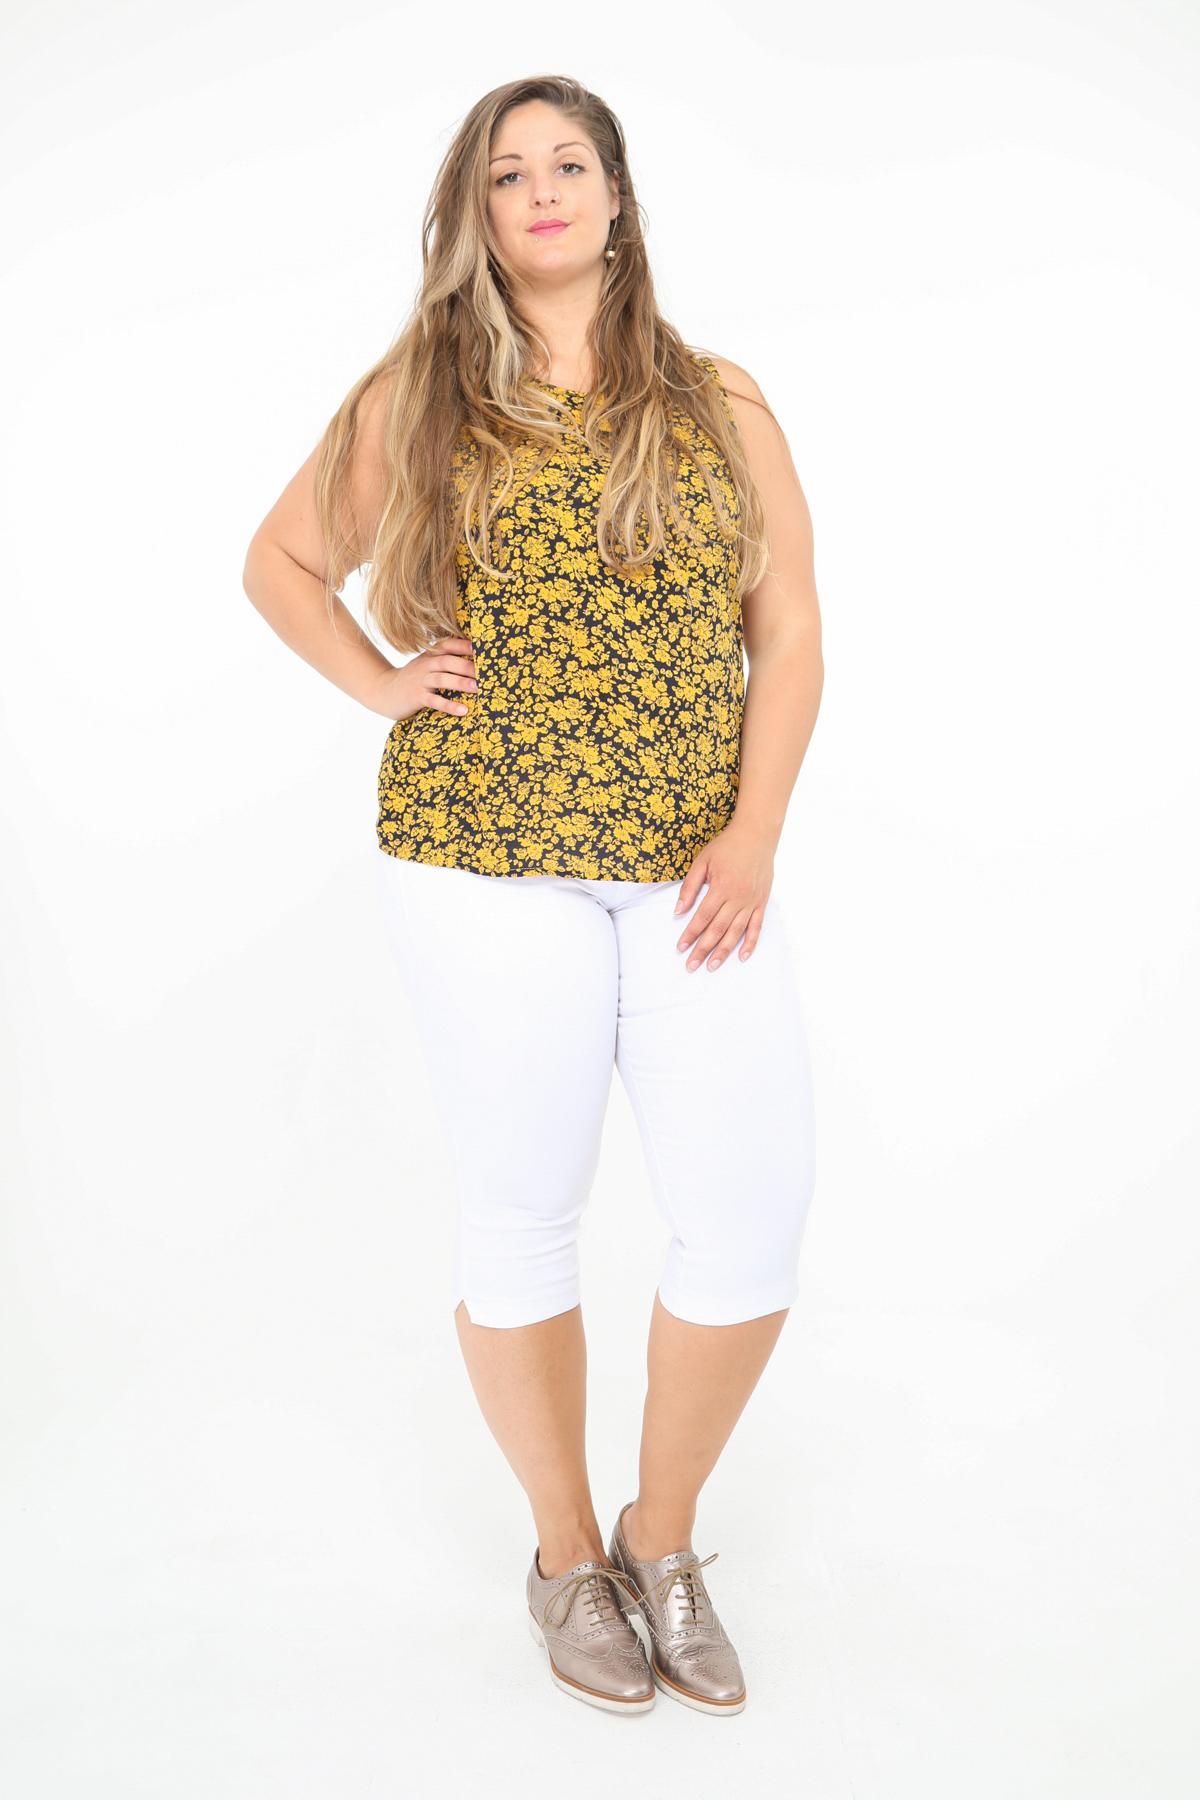 Tops Donna Yellow Christy C283 #c eFashion Paris